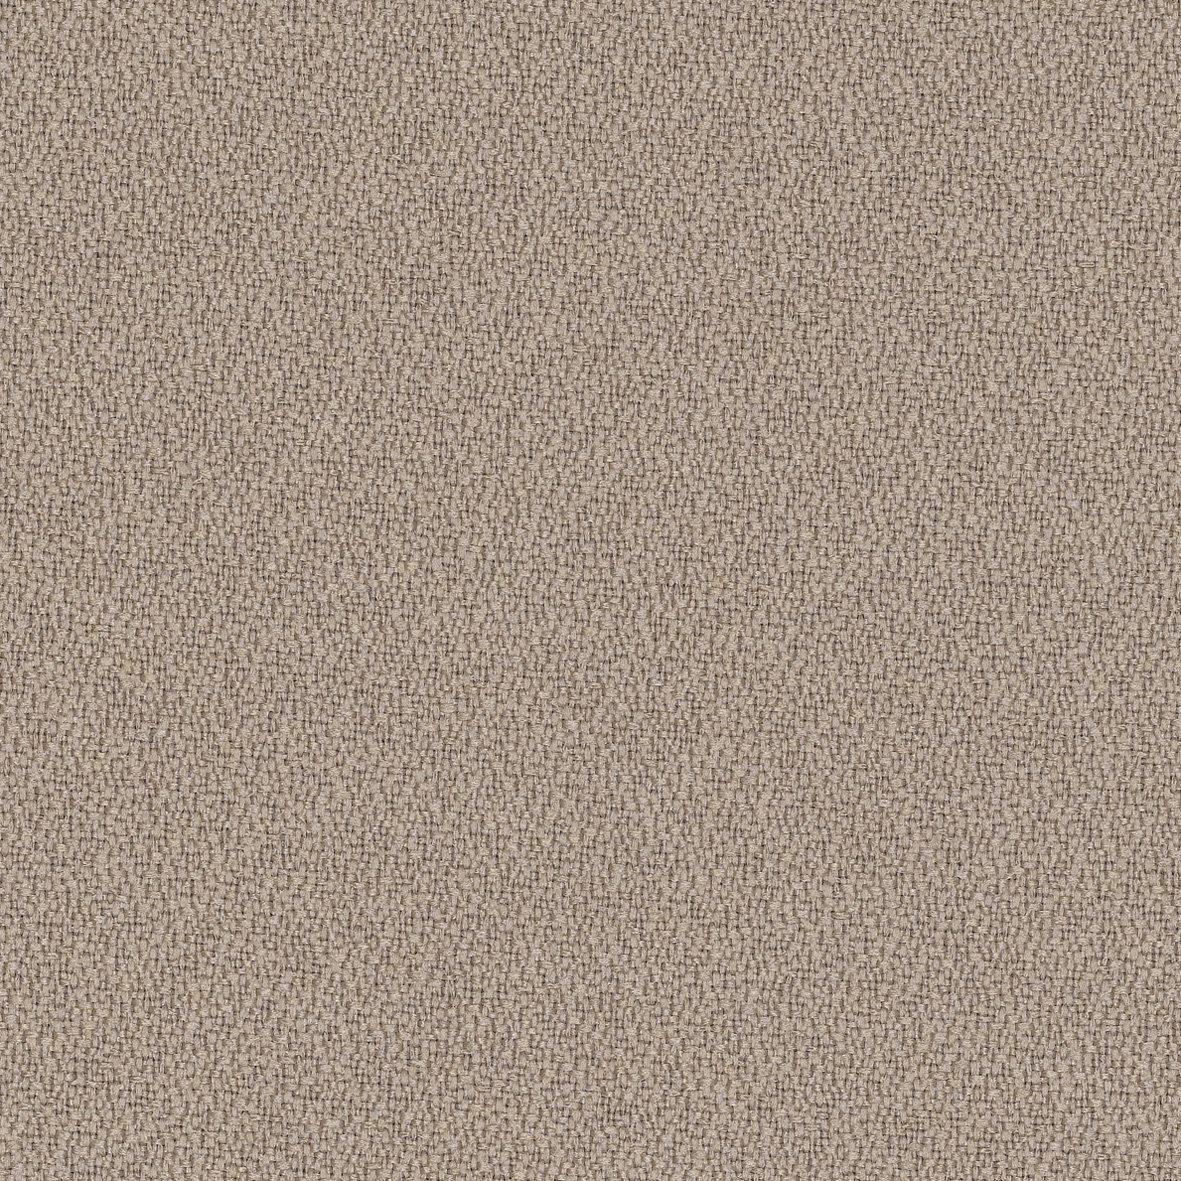 Softline bordskærmvæg beige B1000xH590 mm